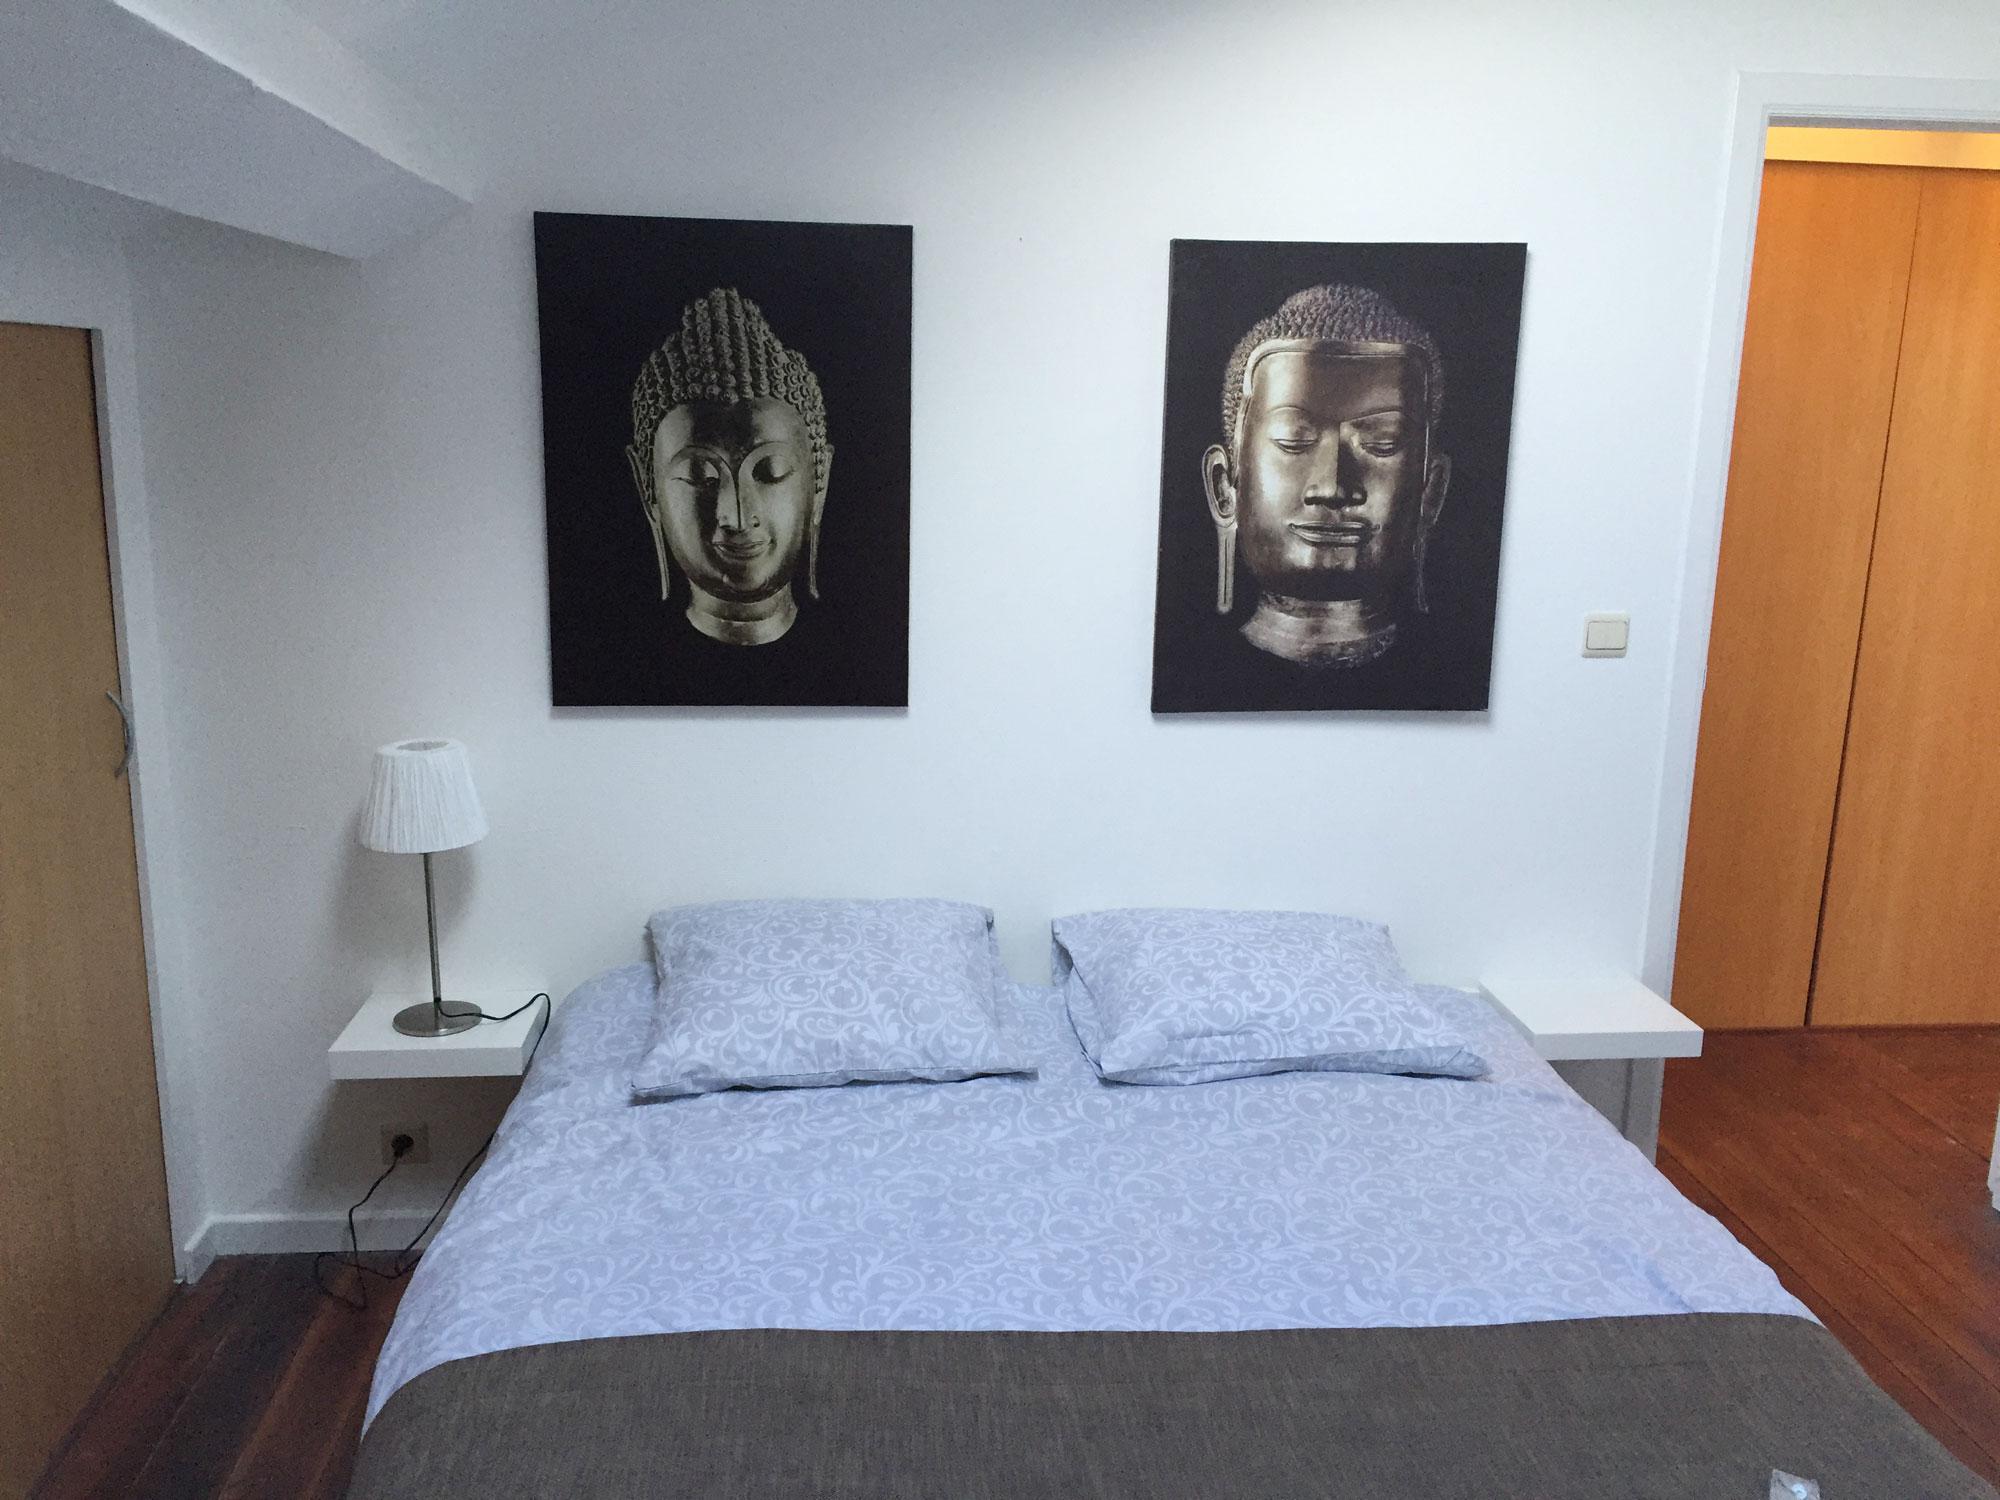 appartement louer li ge meubl location appartement. Black Bedroom Furniture Sets. Home Design Ideas